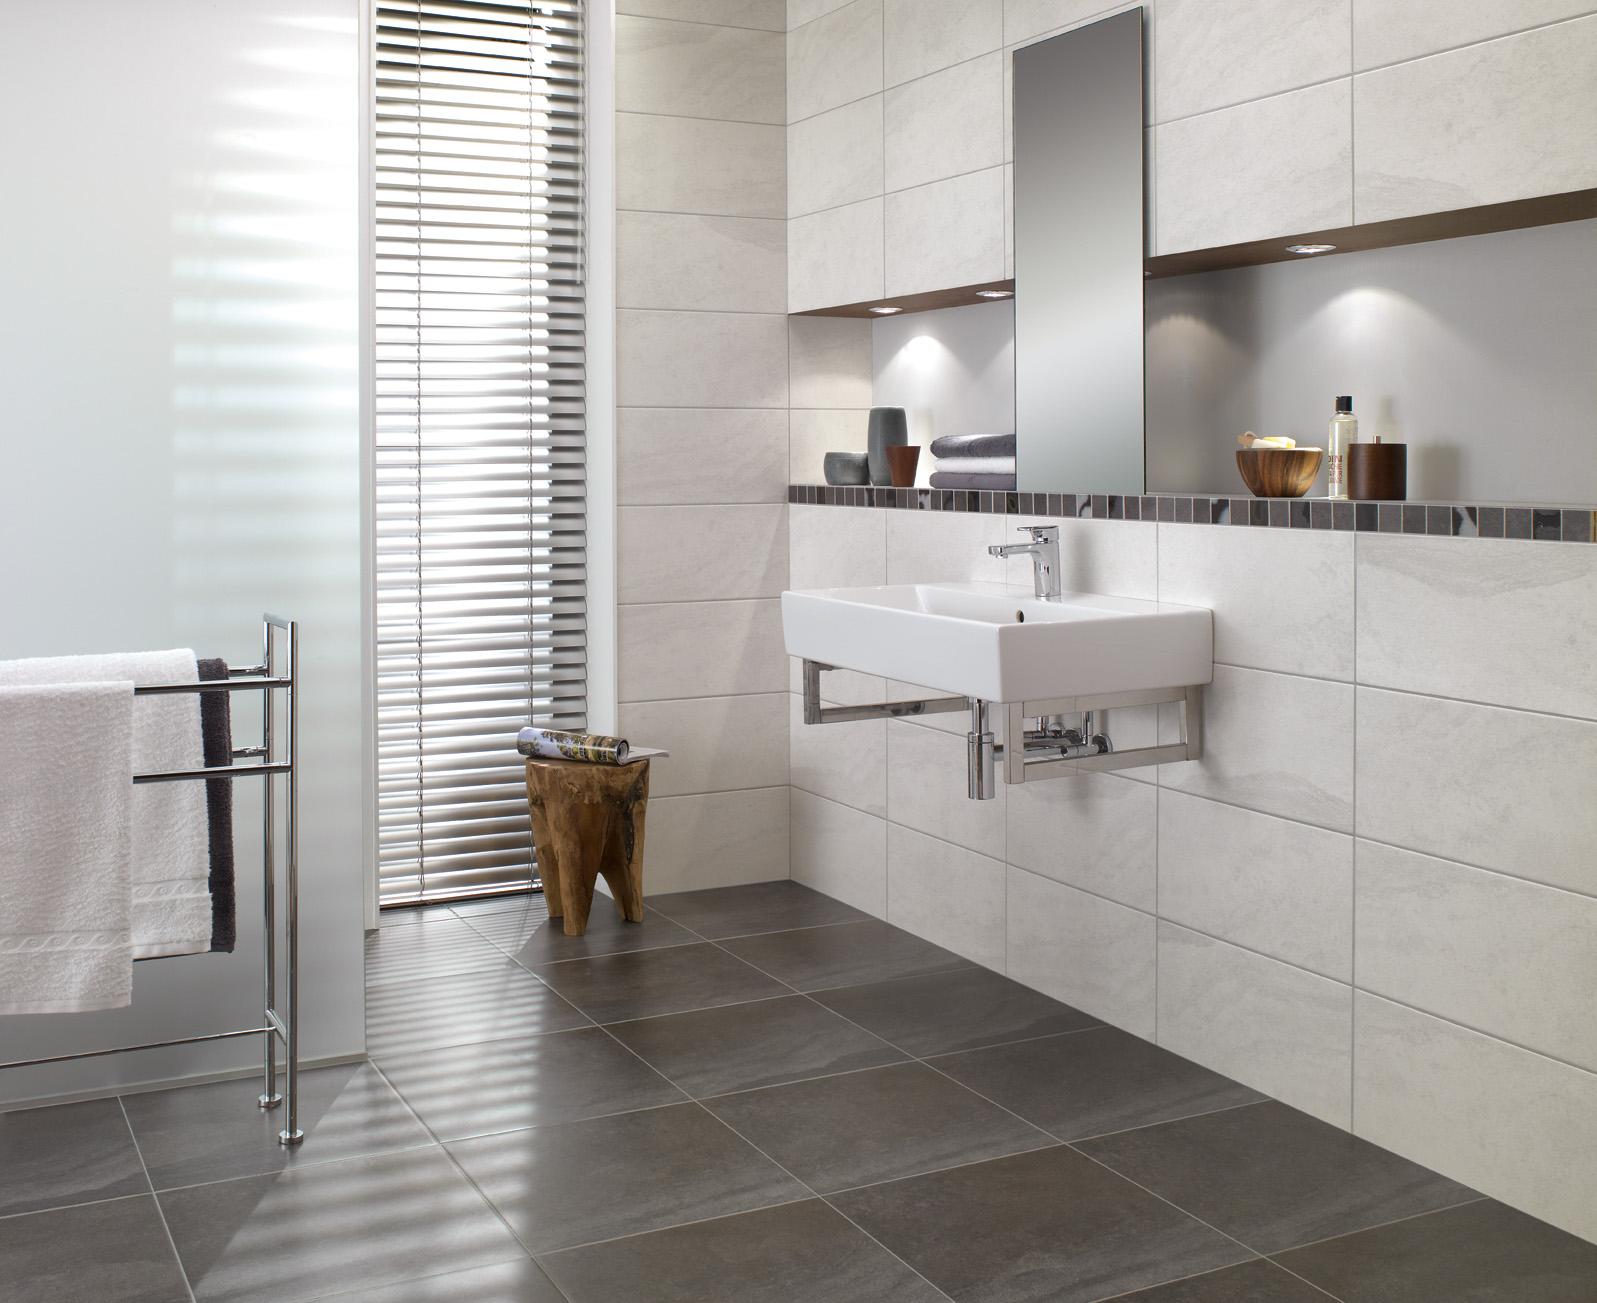 Bathroom Tiles Tiling Designs Wall Choosing Bathroom Tiles Bathroom Tiles  Cape Town